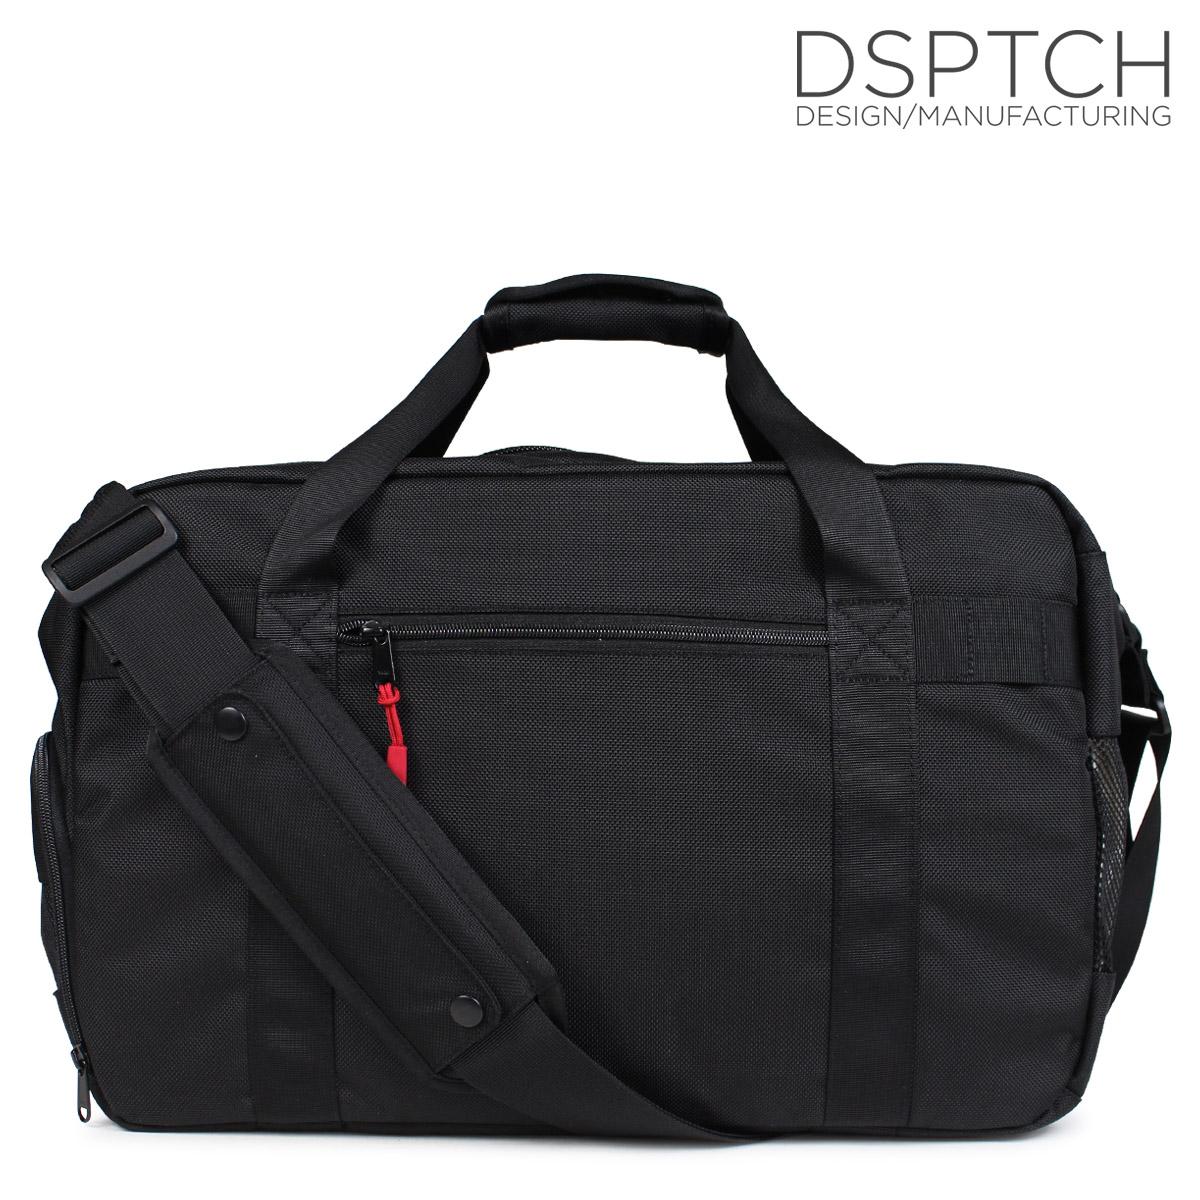 DSPTCH ディスパッチ バッグ ジムバッグ メンズ レディース GYM WORK BAG 23L ブラック 黒 PCK-GW